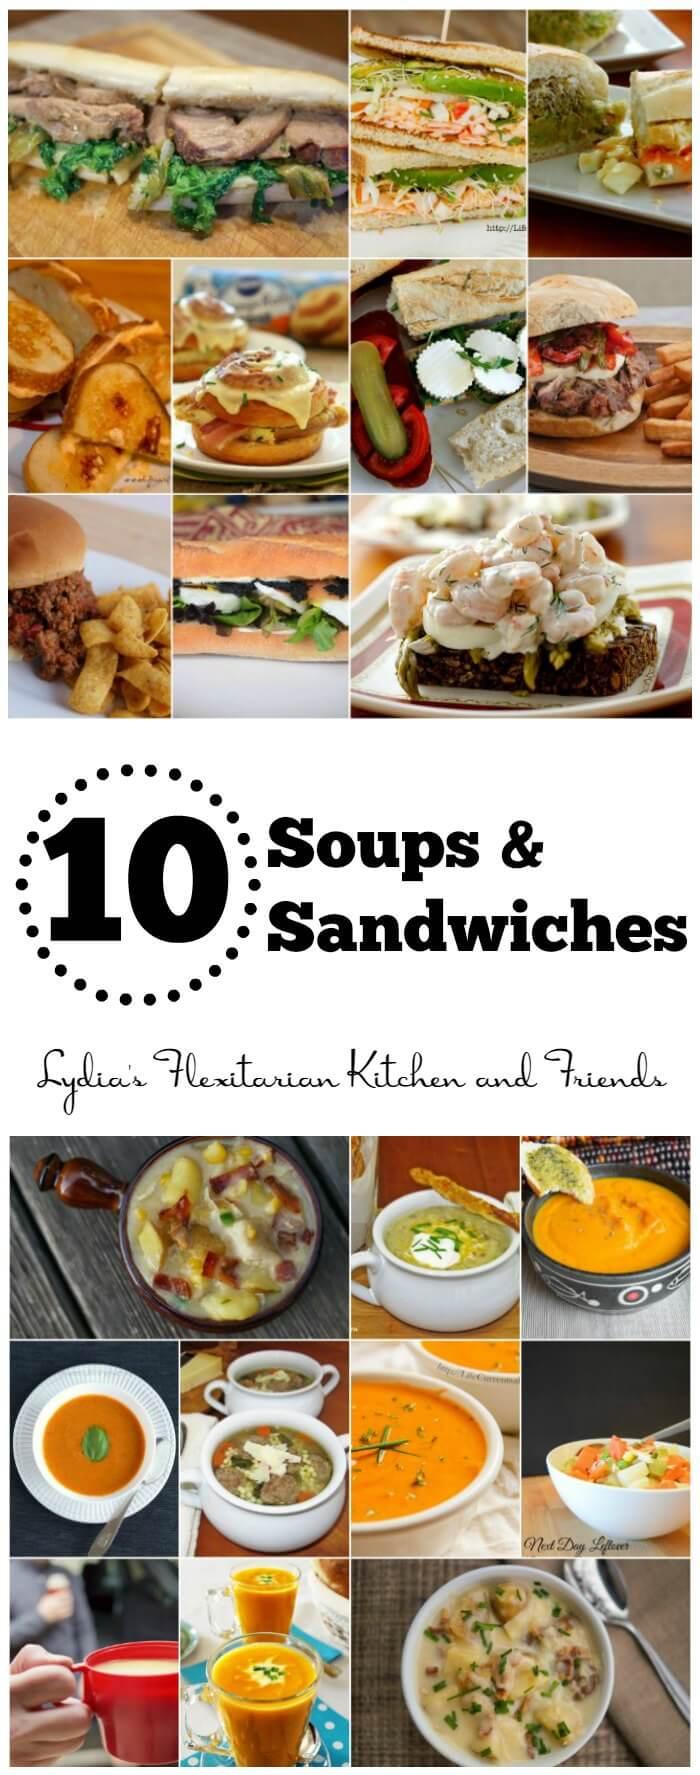 10 Soups, 10 Sandwiches, plenty of combinations ~ Lydia's Flexitarian Kitchen & Friends